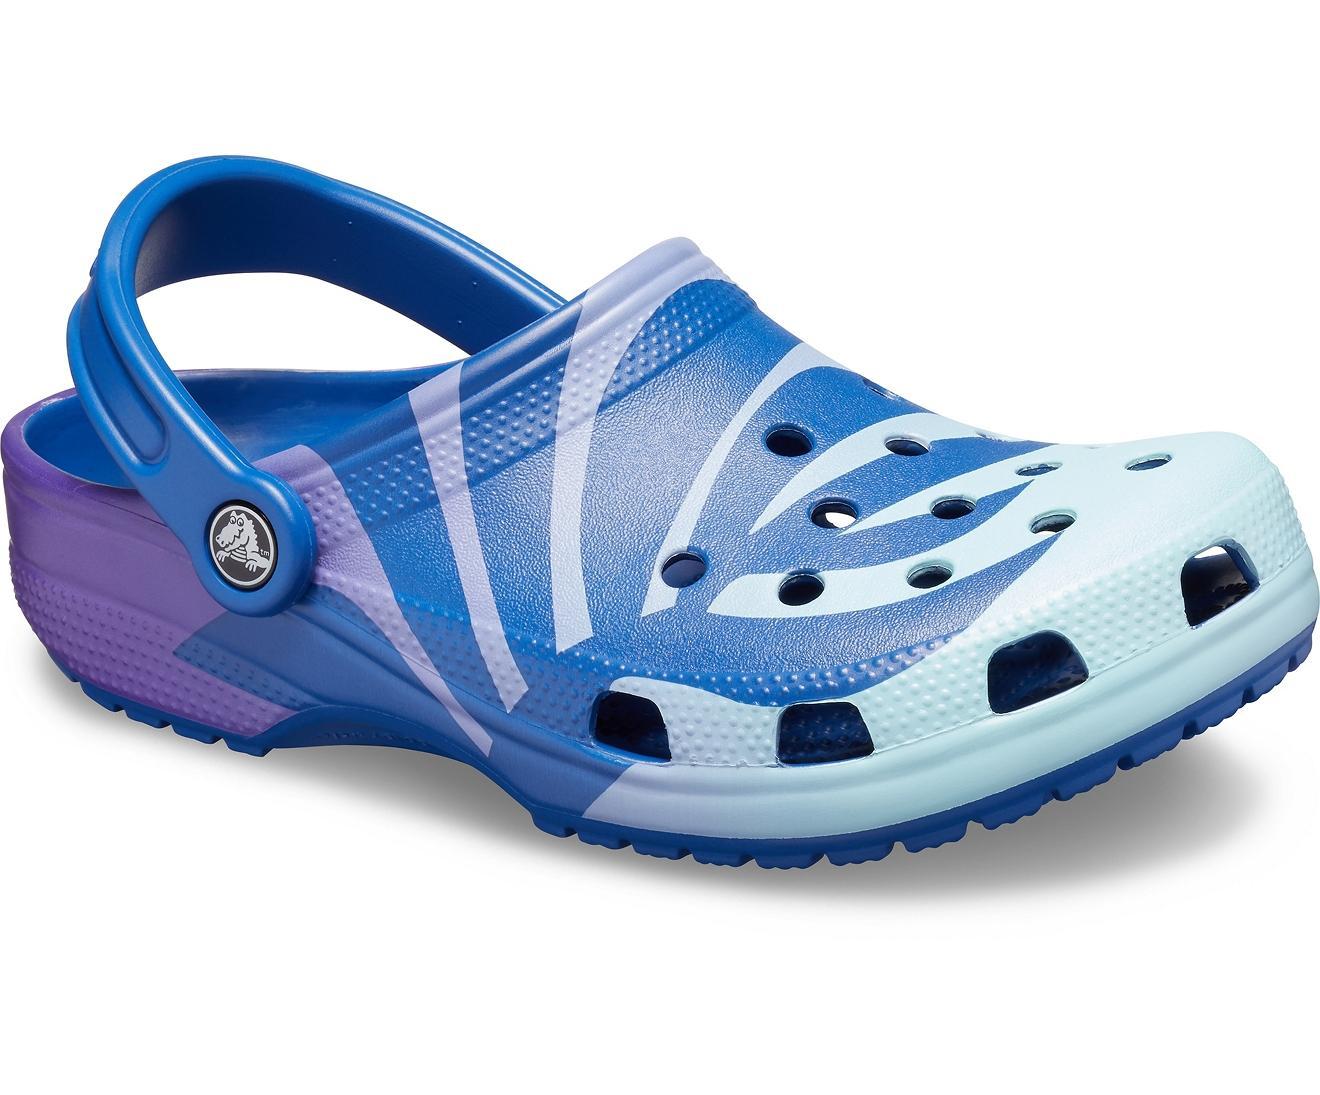 ffcd8d1bc Lyst - Crocs™ Classic Seasonal Graphic Clog in Blue